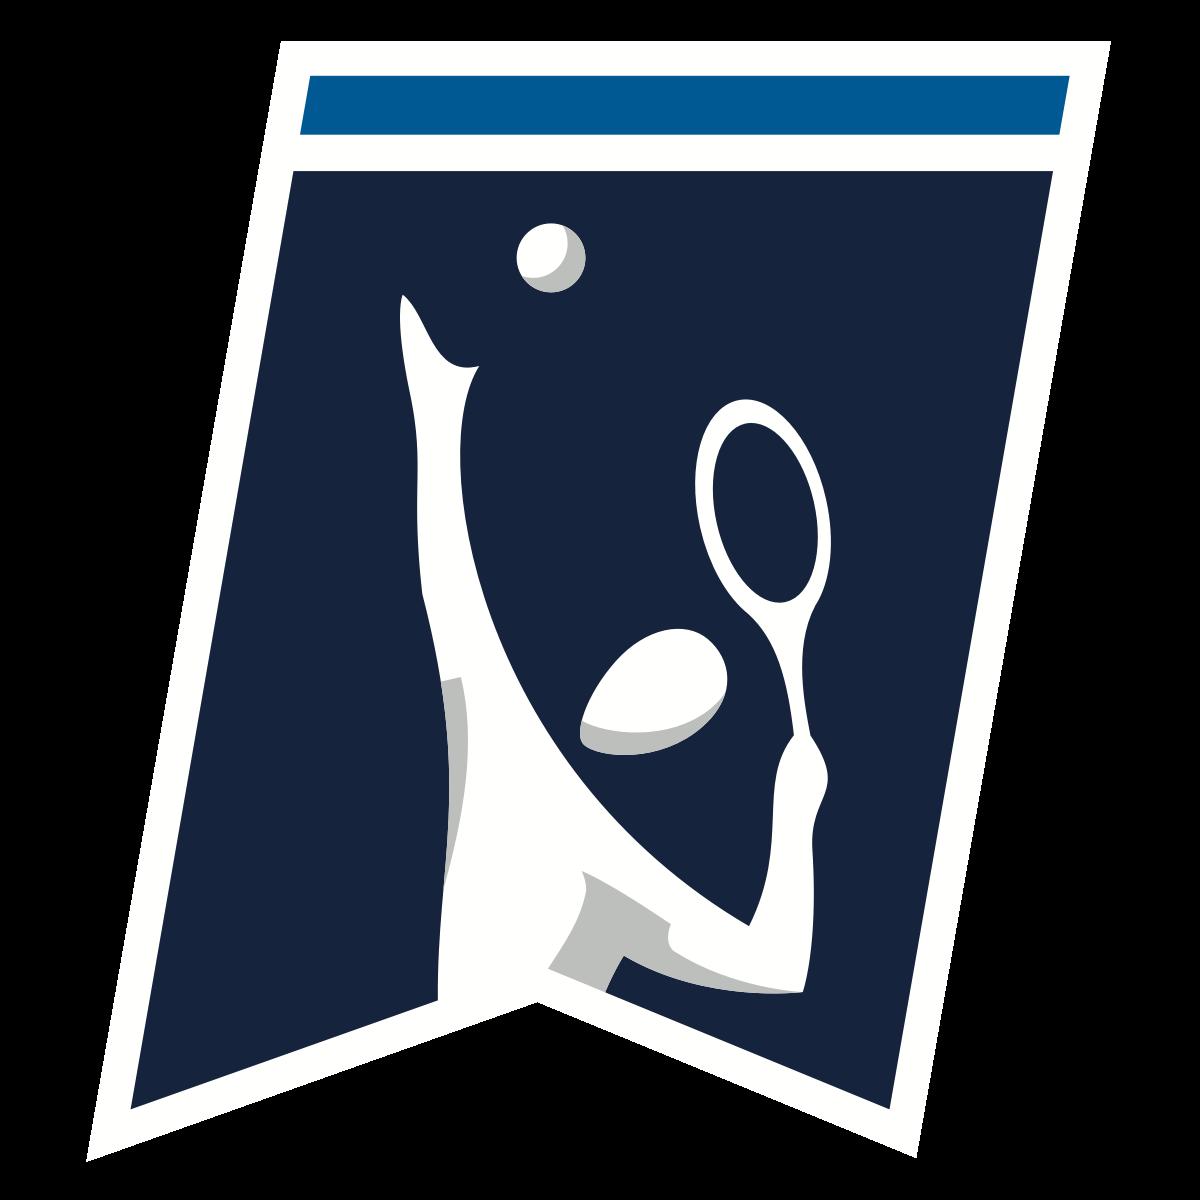 2018 DI Men's Tennis Championship